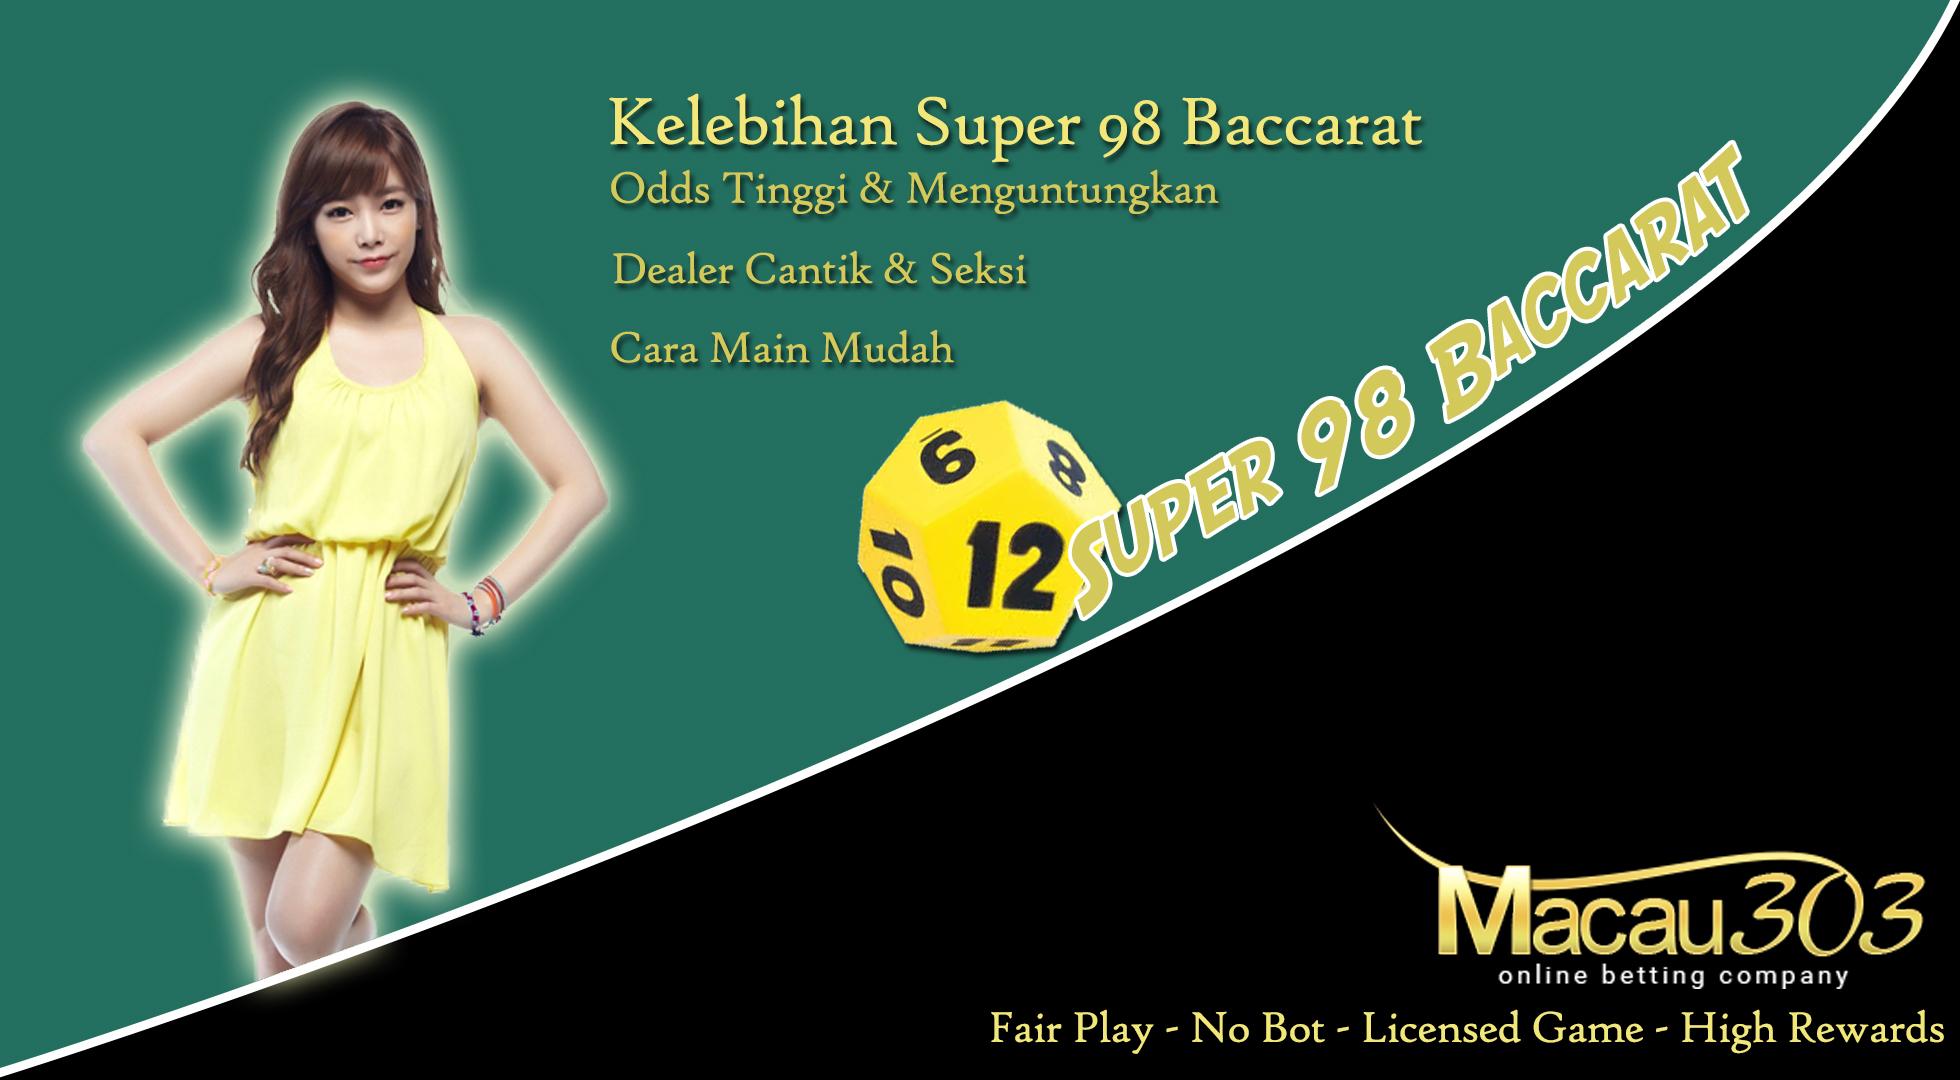 Super 98 Baccarat